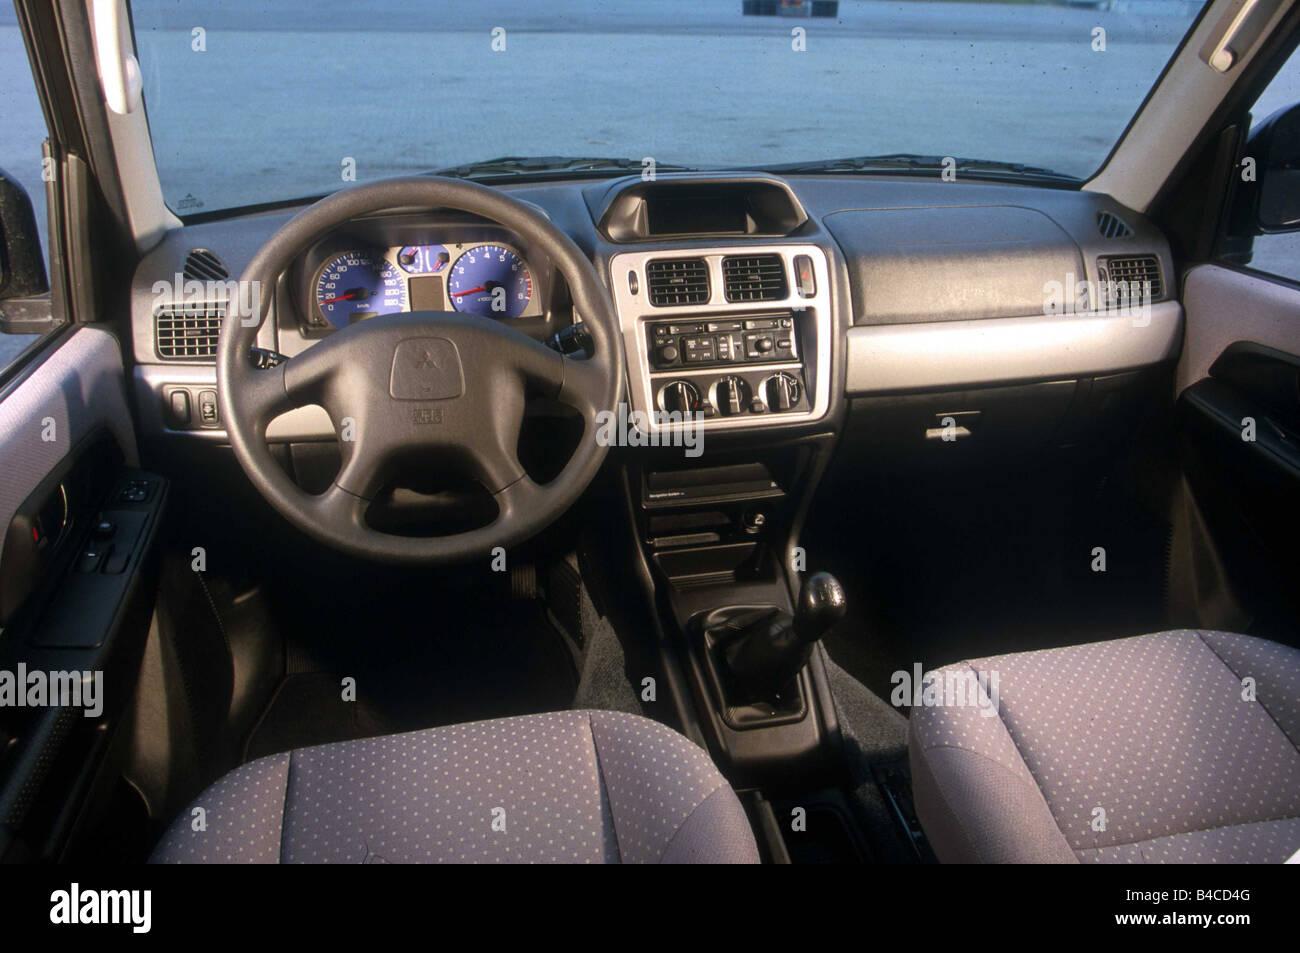 Car Mitsubishi Pajero Pinin cross country vehicle model year